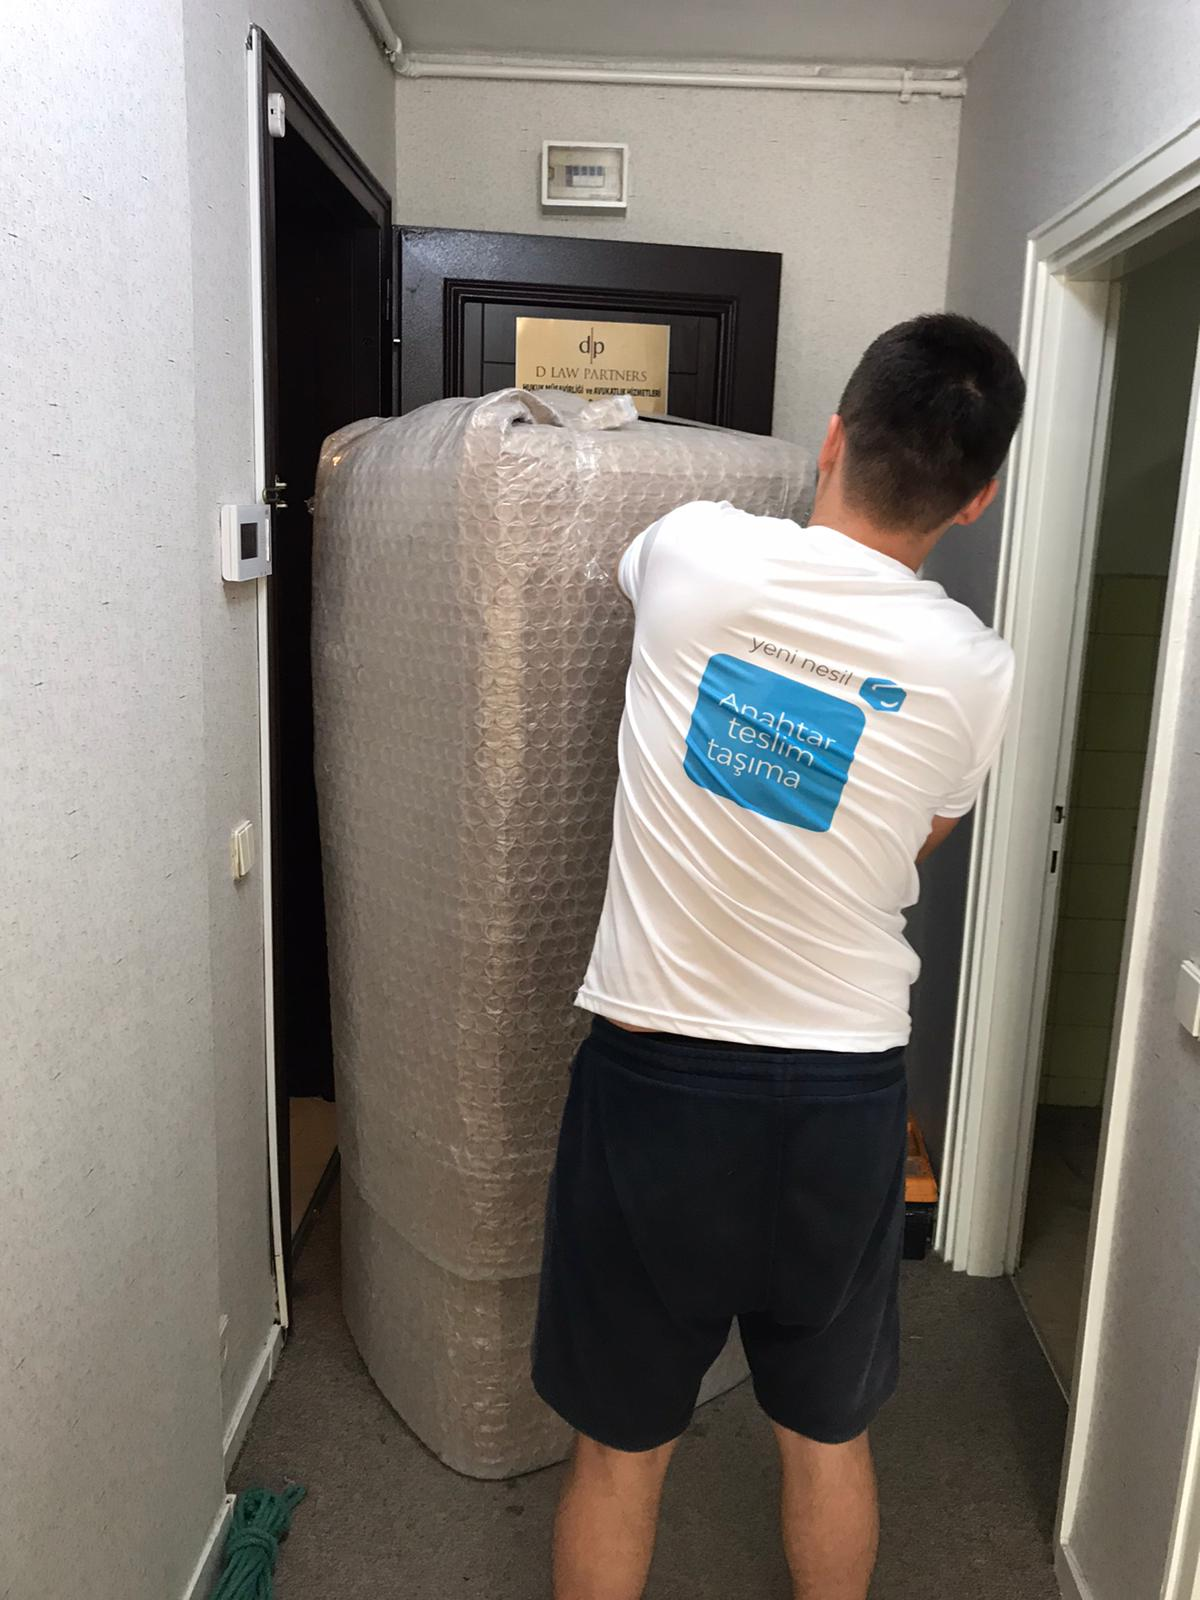 eTaşın Ofis Buzdolabı Taşıma